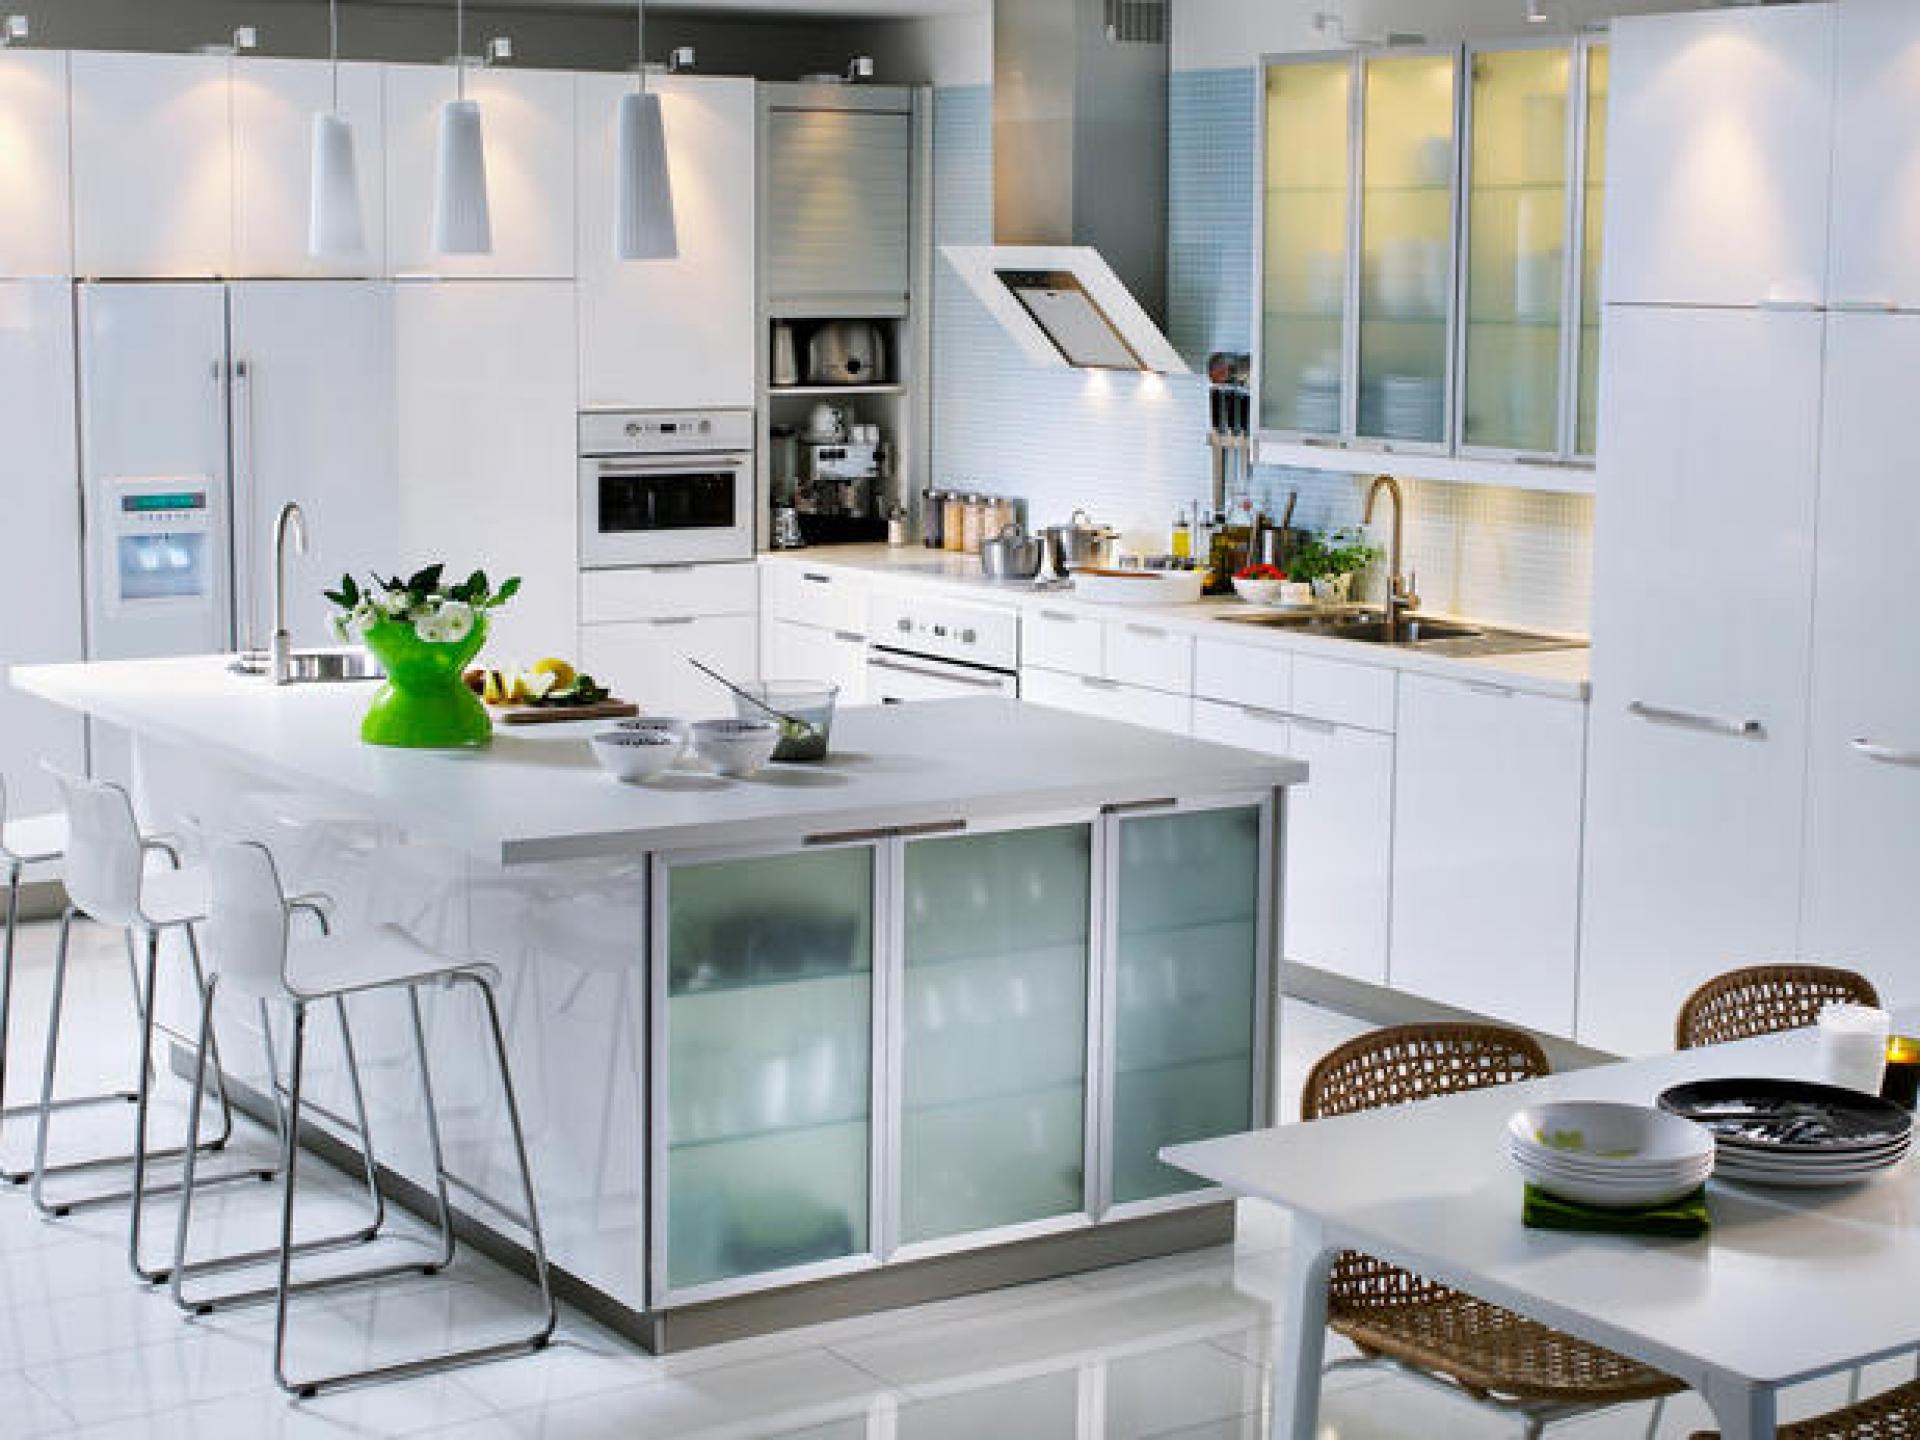 ikea kitchen design application from design software kitchen online kitchen design The Online Kitchen Design Application From Ikea Custom Home Design